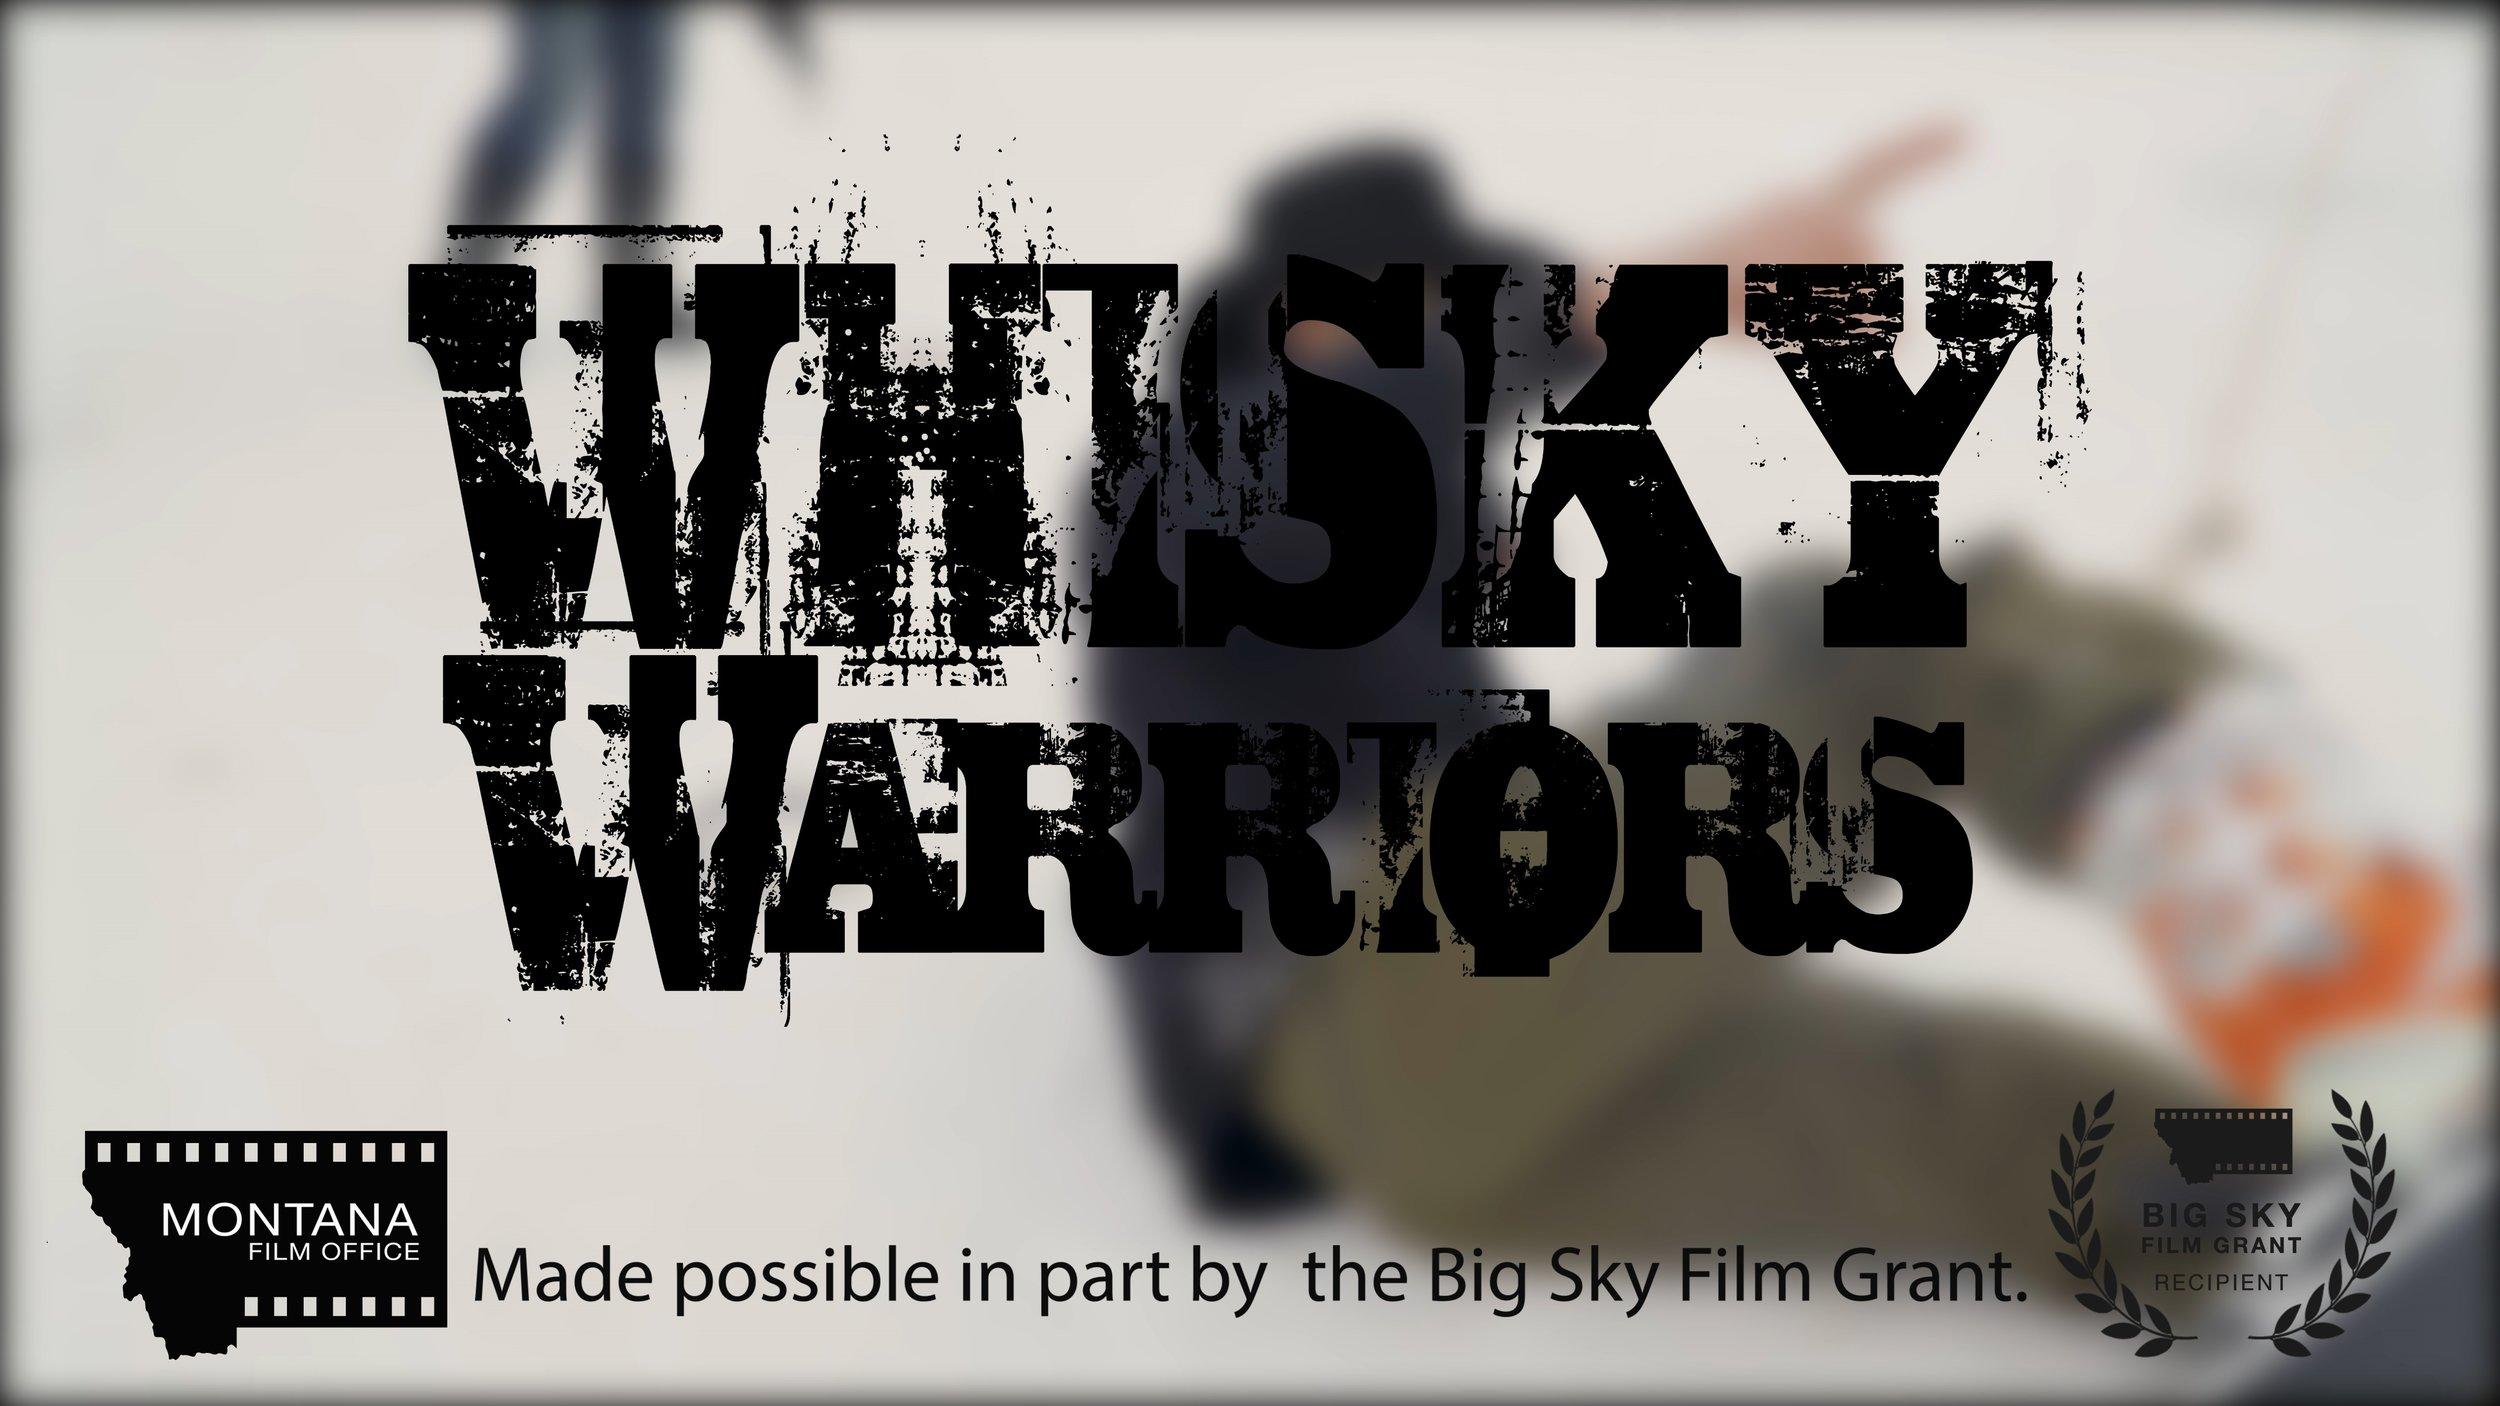 WhiskyWarriors_ExclusiveTrailer_STILL (1).jpg